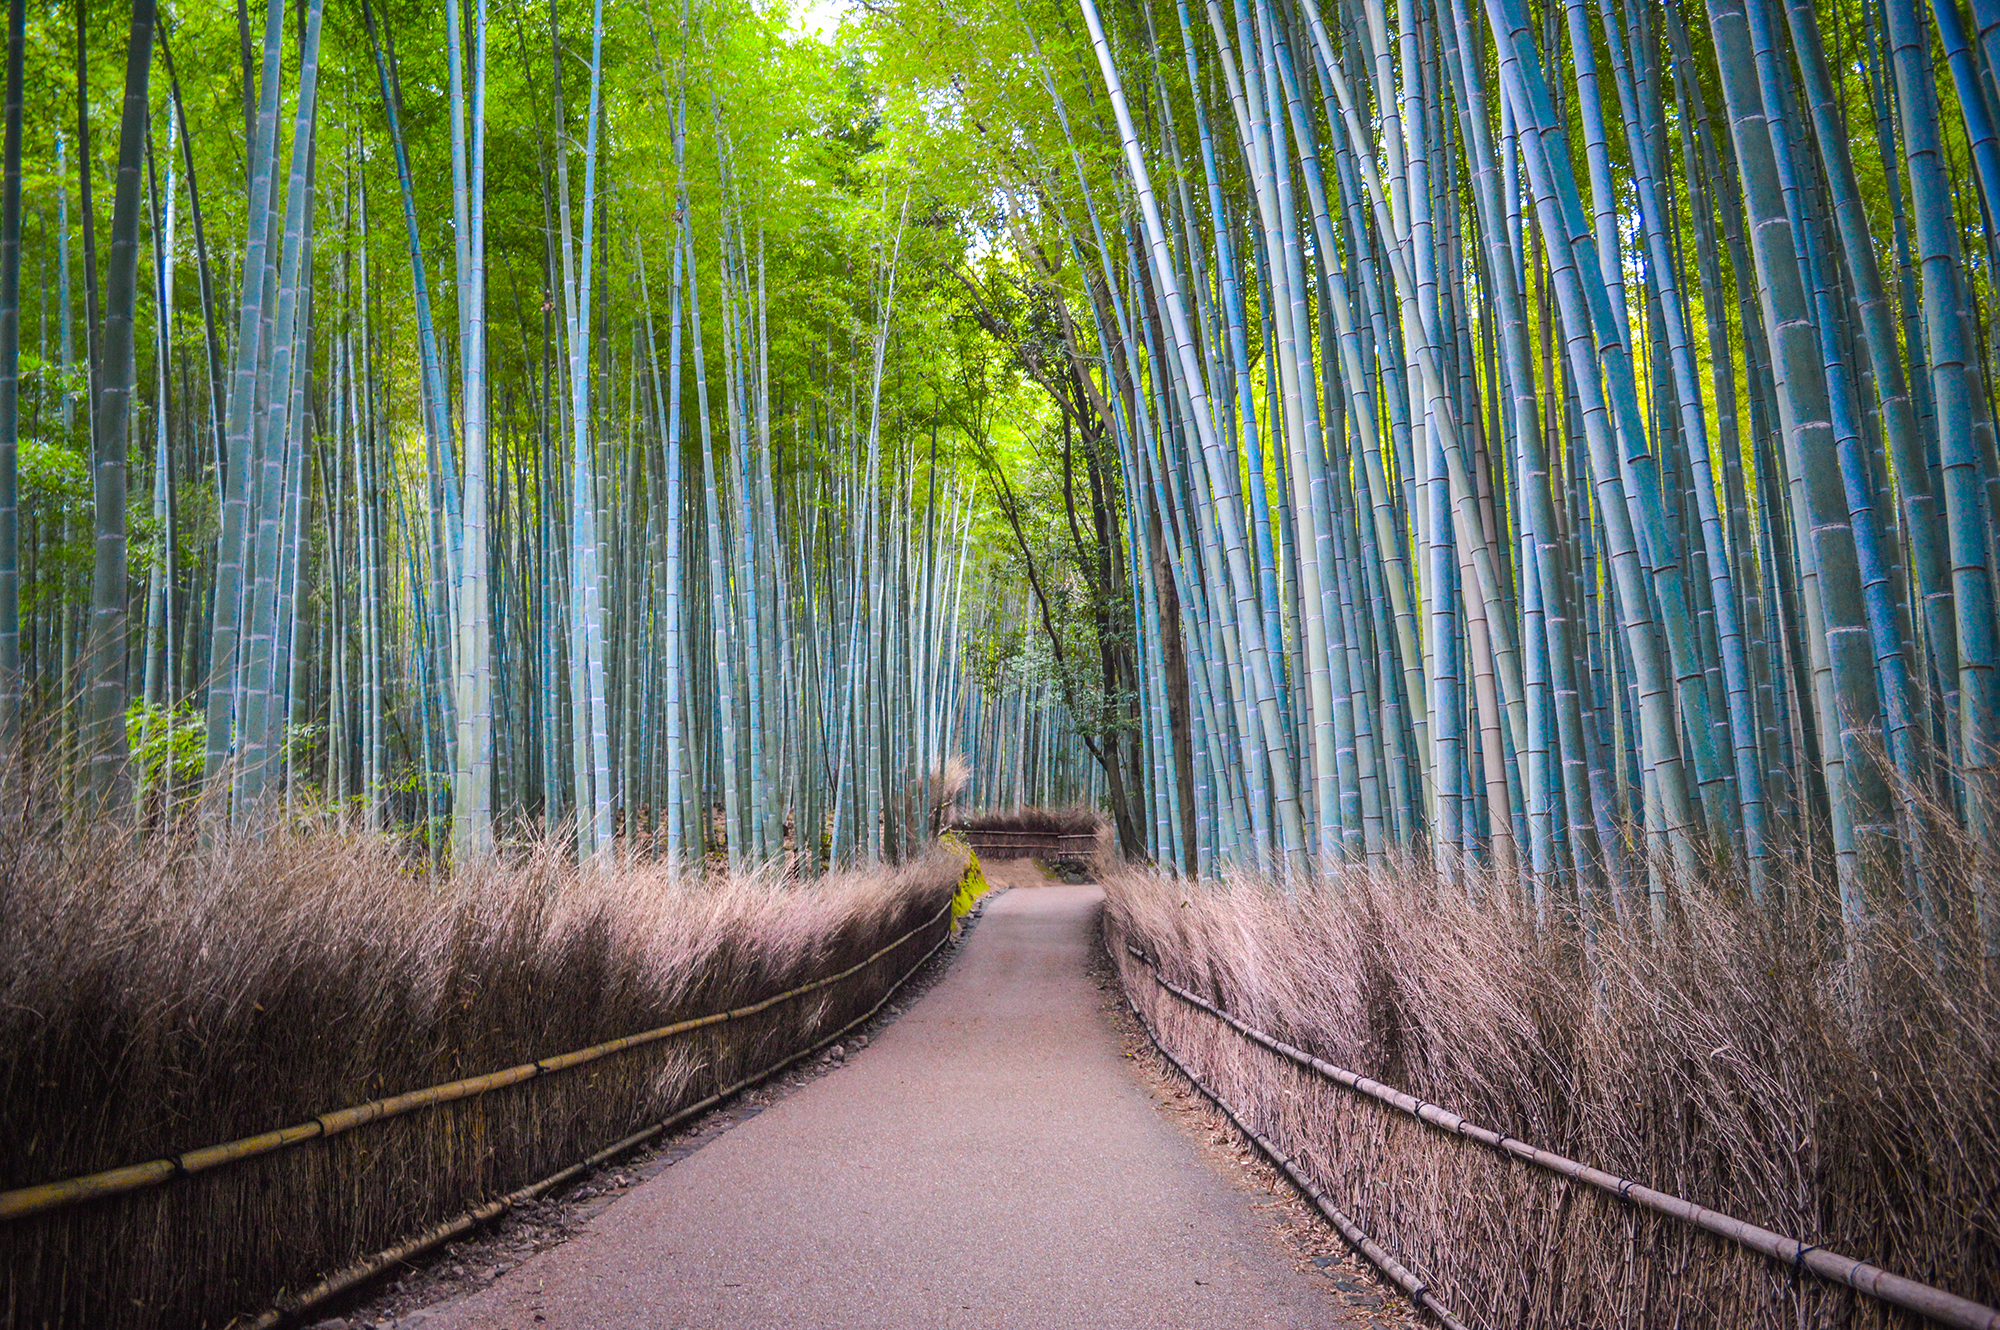 Kyoto's Arashiyama Bamboo Grove is a Japan must-see!